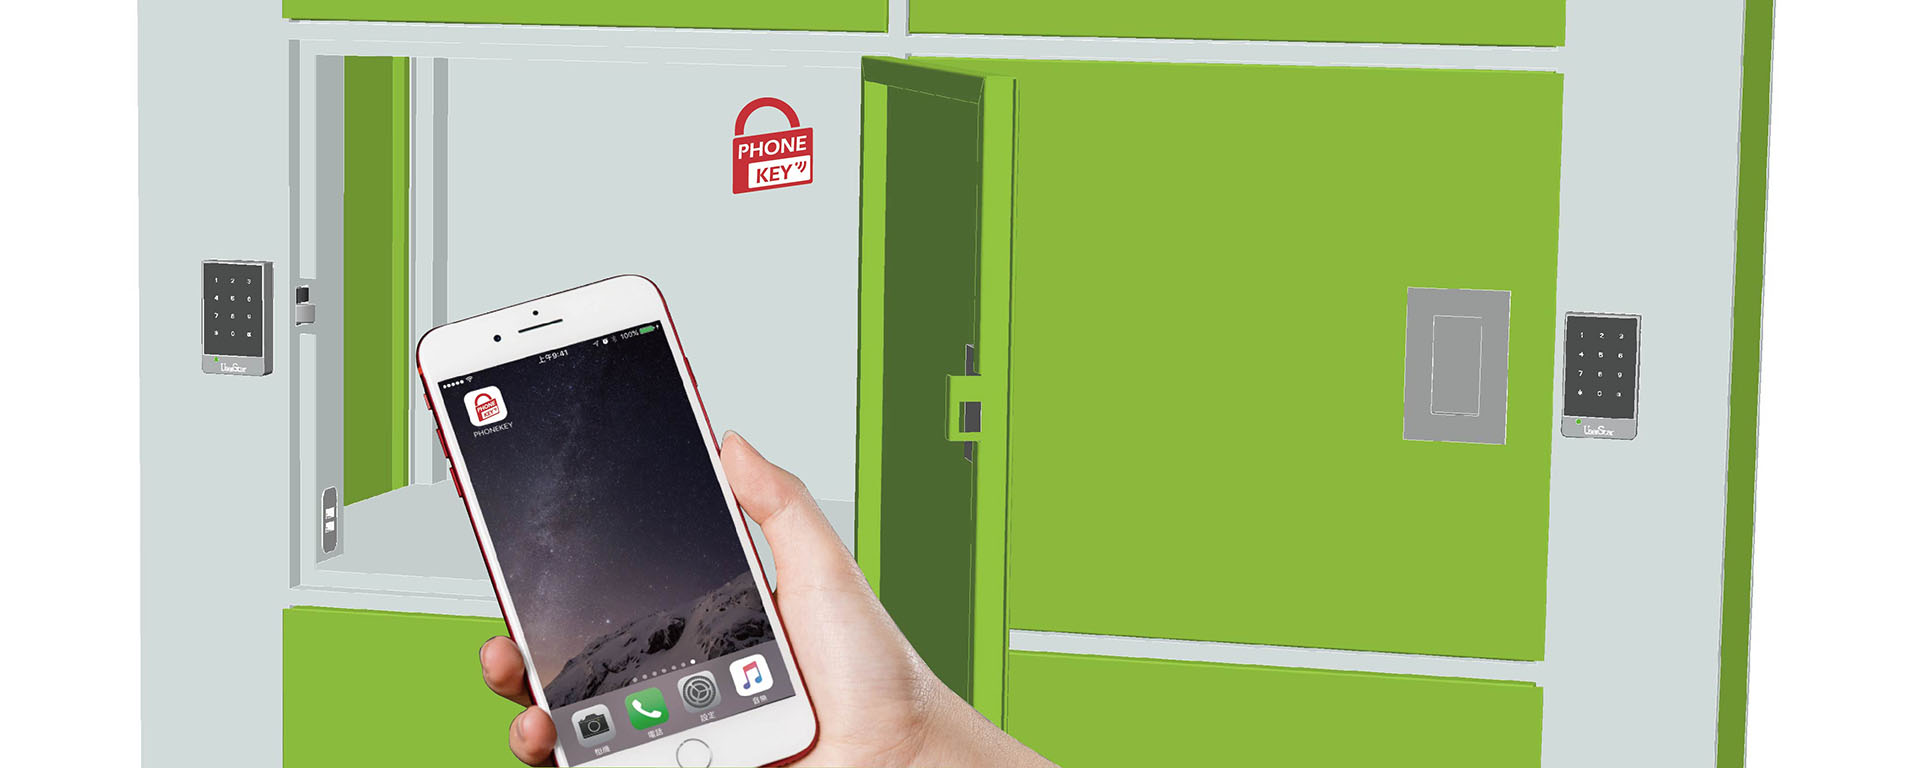 Bluetooth mobile phone unlock locker with external keypad or key